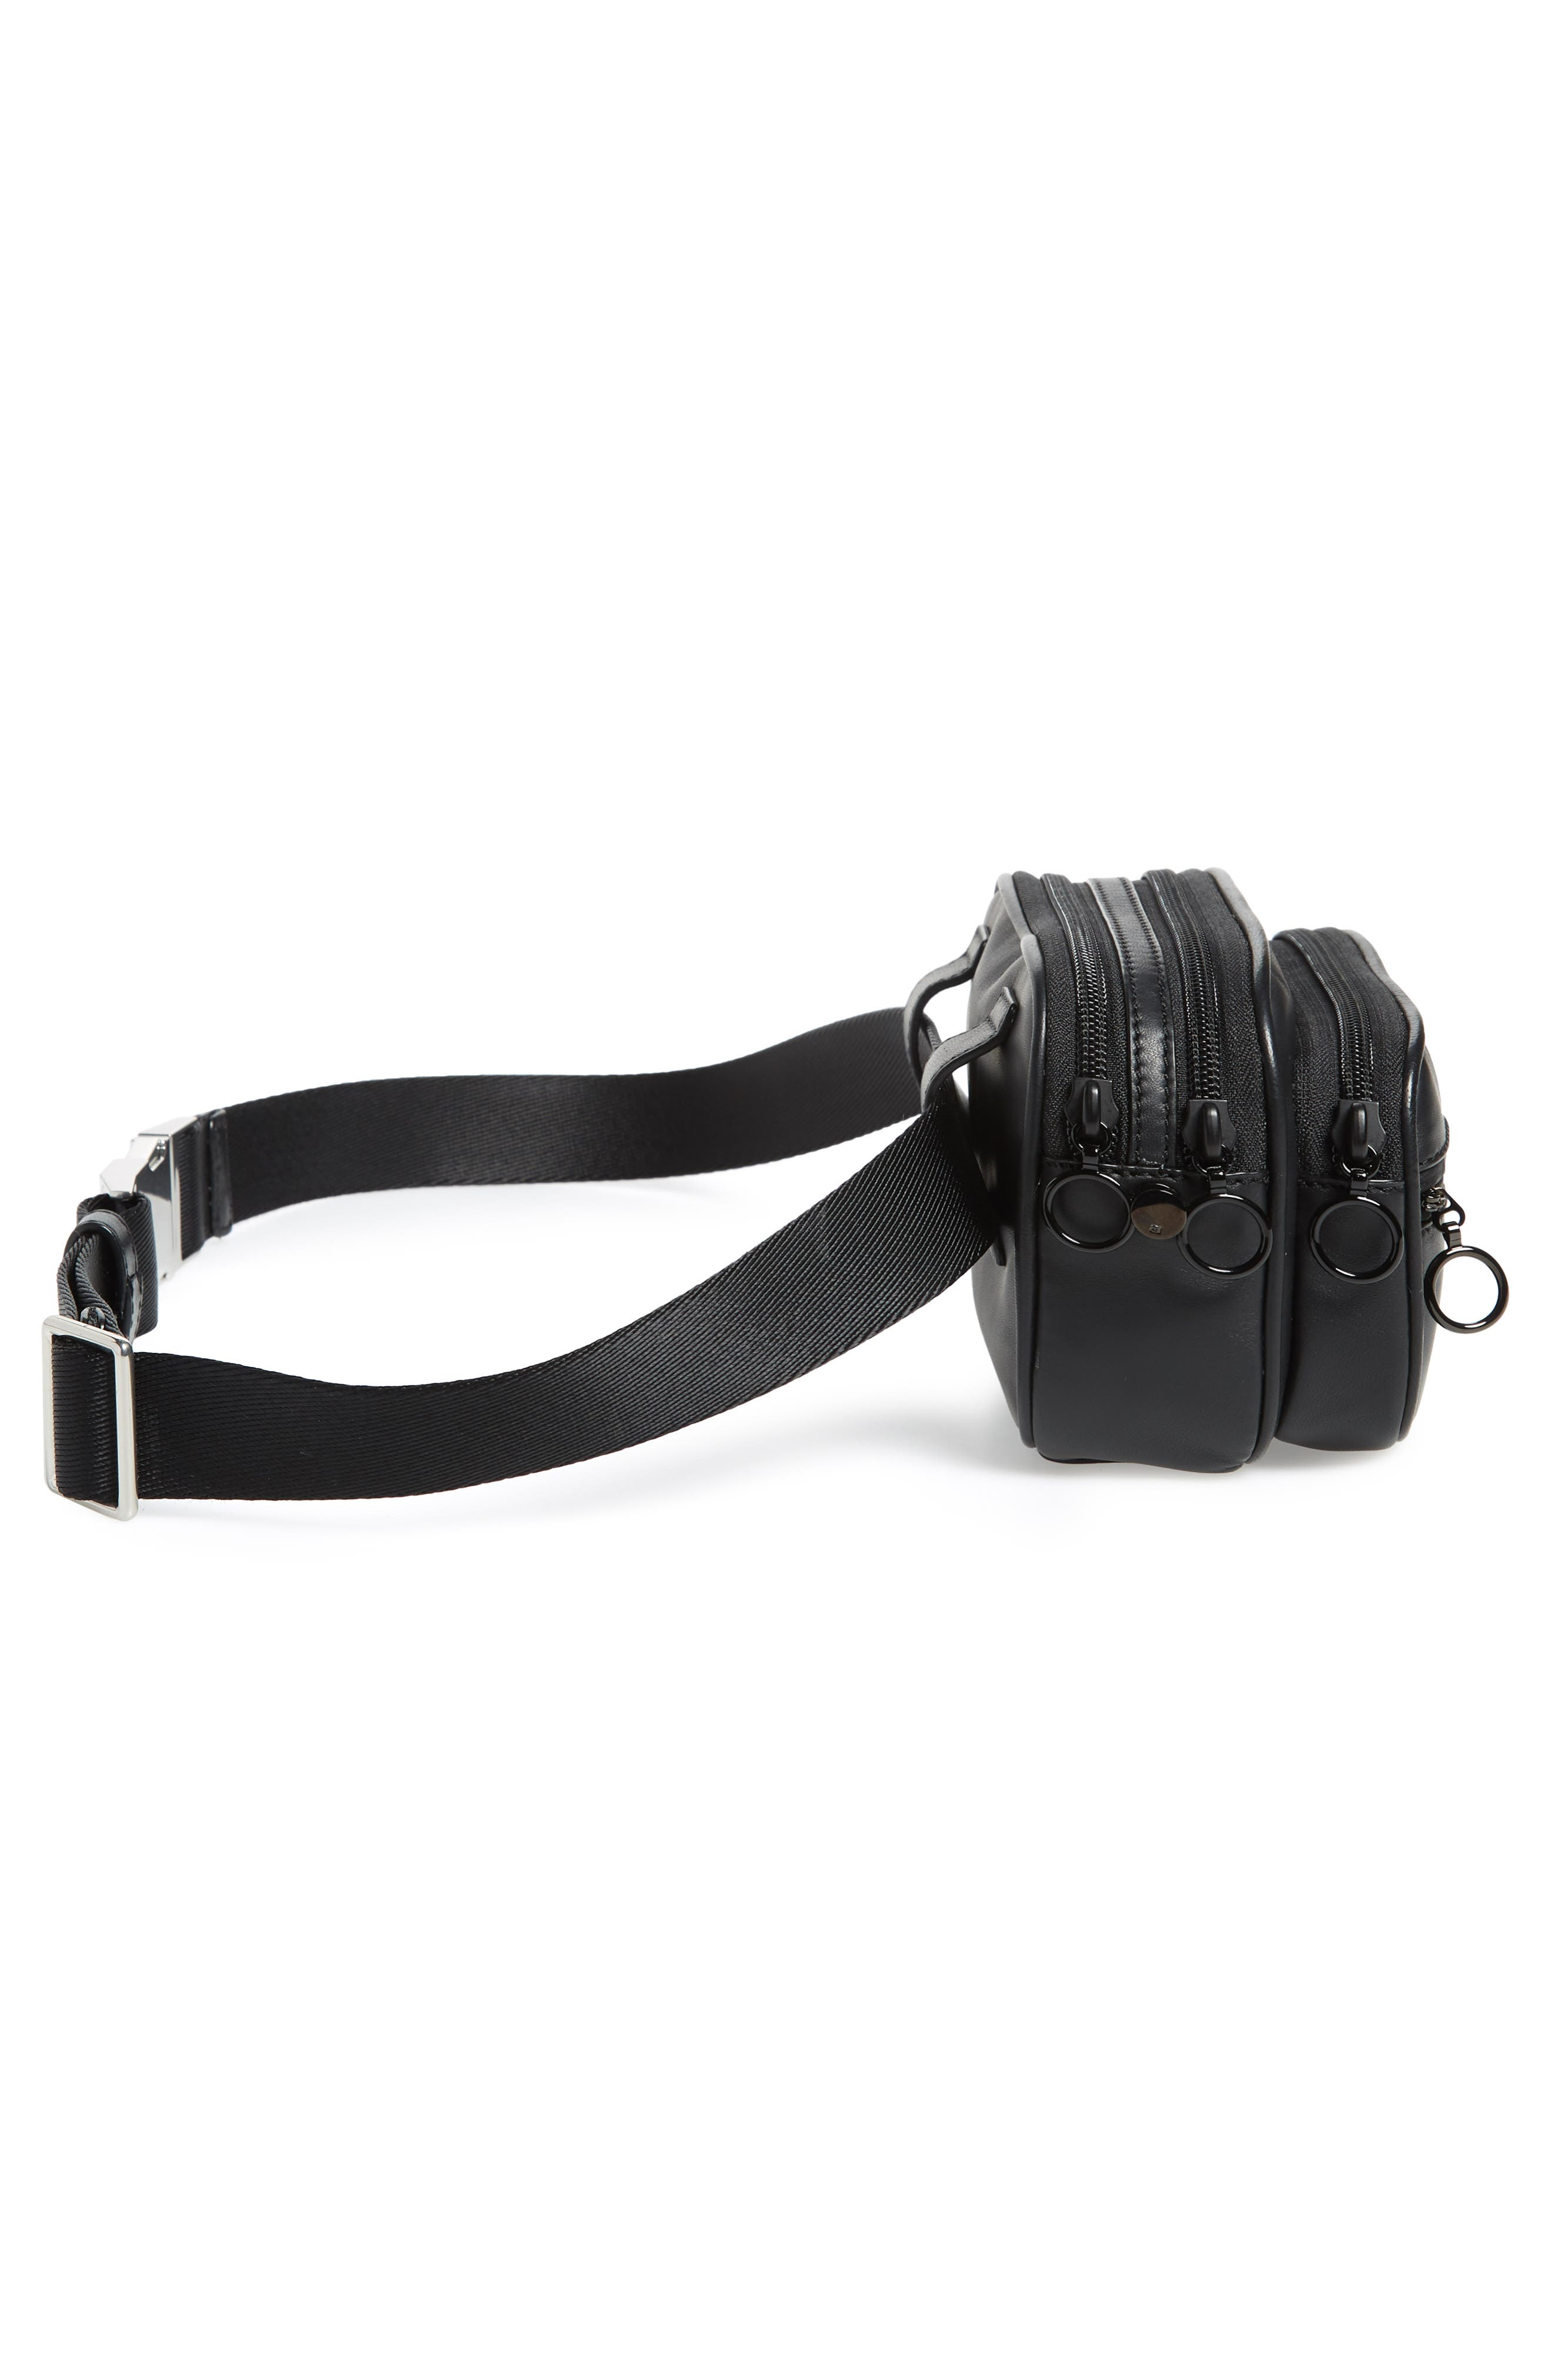 ALEXANDER WANG, Attica Logo Leather Belt Bag, Alternate thumbnail 7, color, BLACK